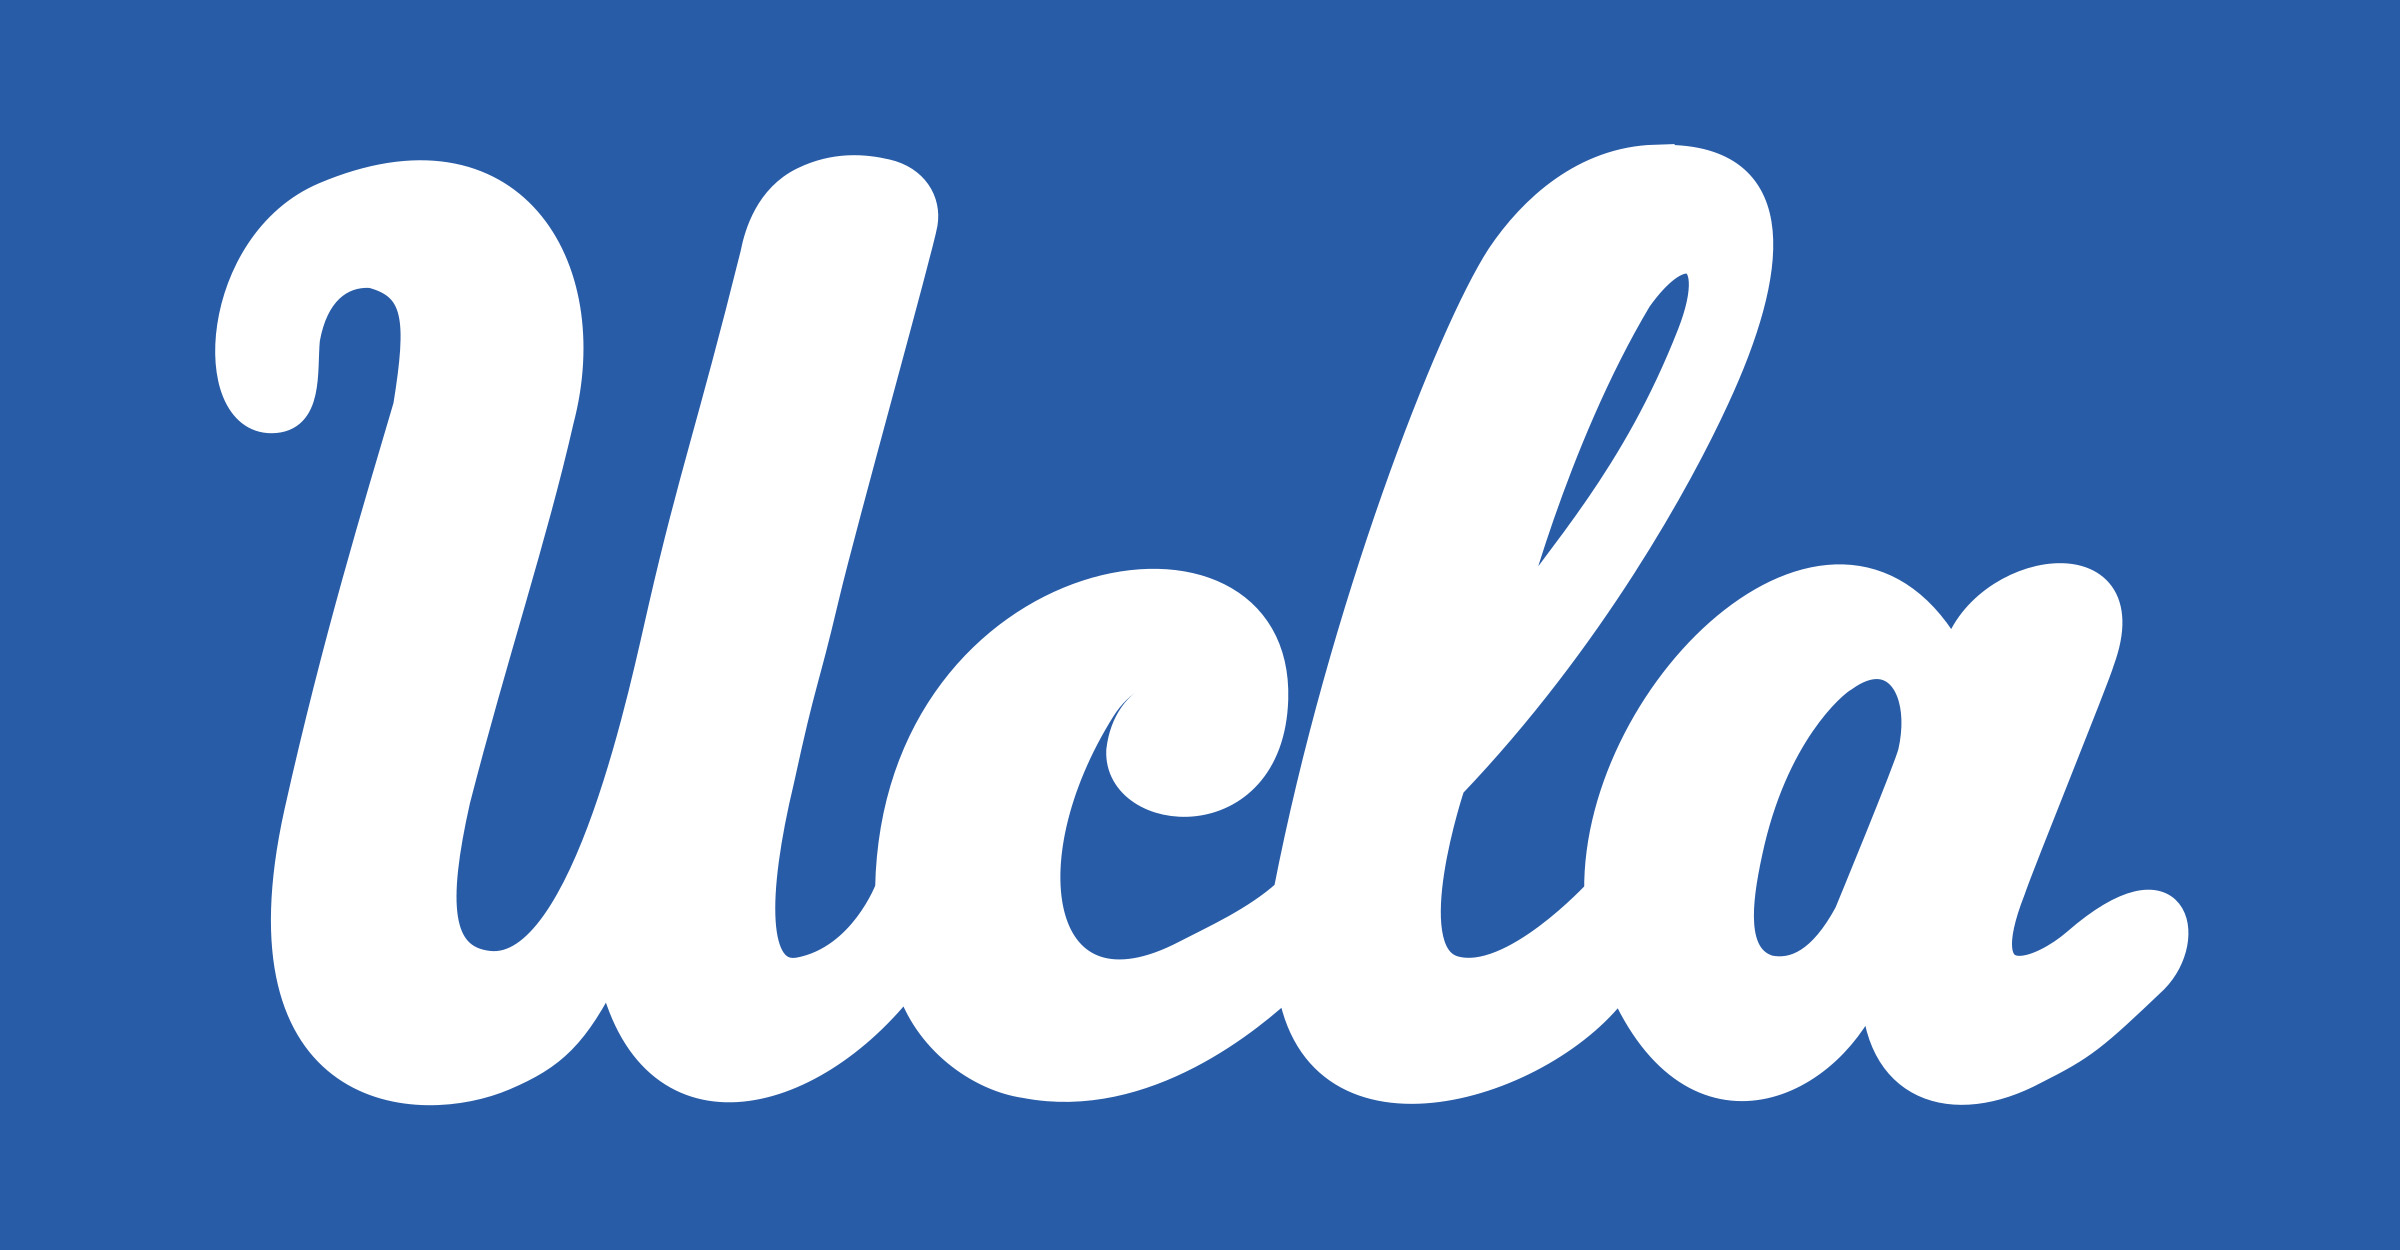 UCLA Logo, UCLA Symbol, Meaning, History and Evolution